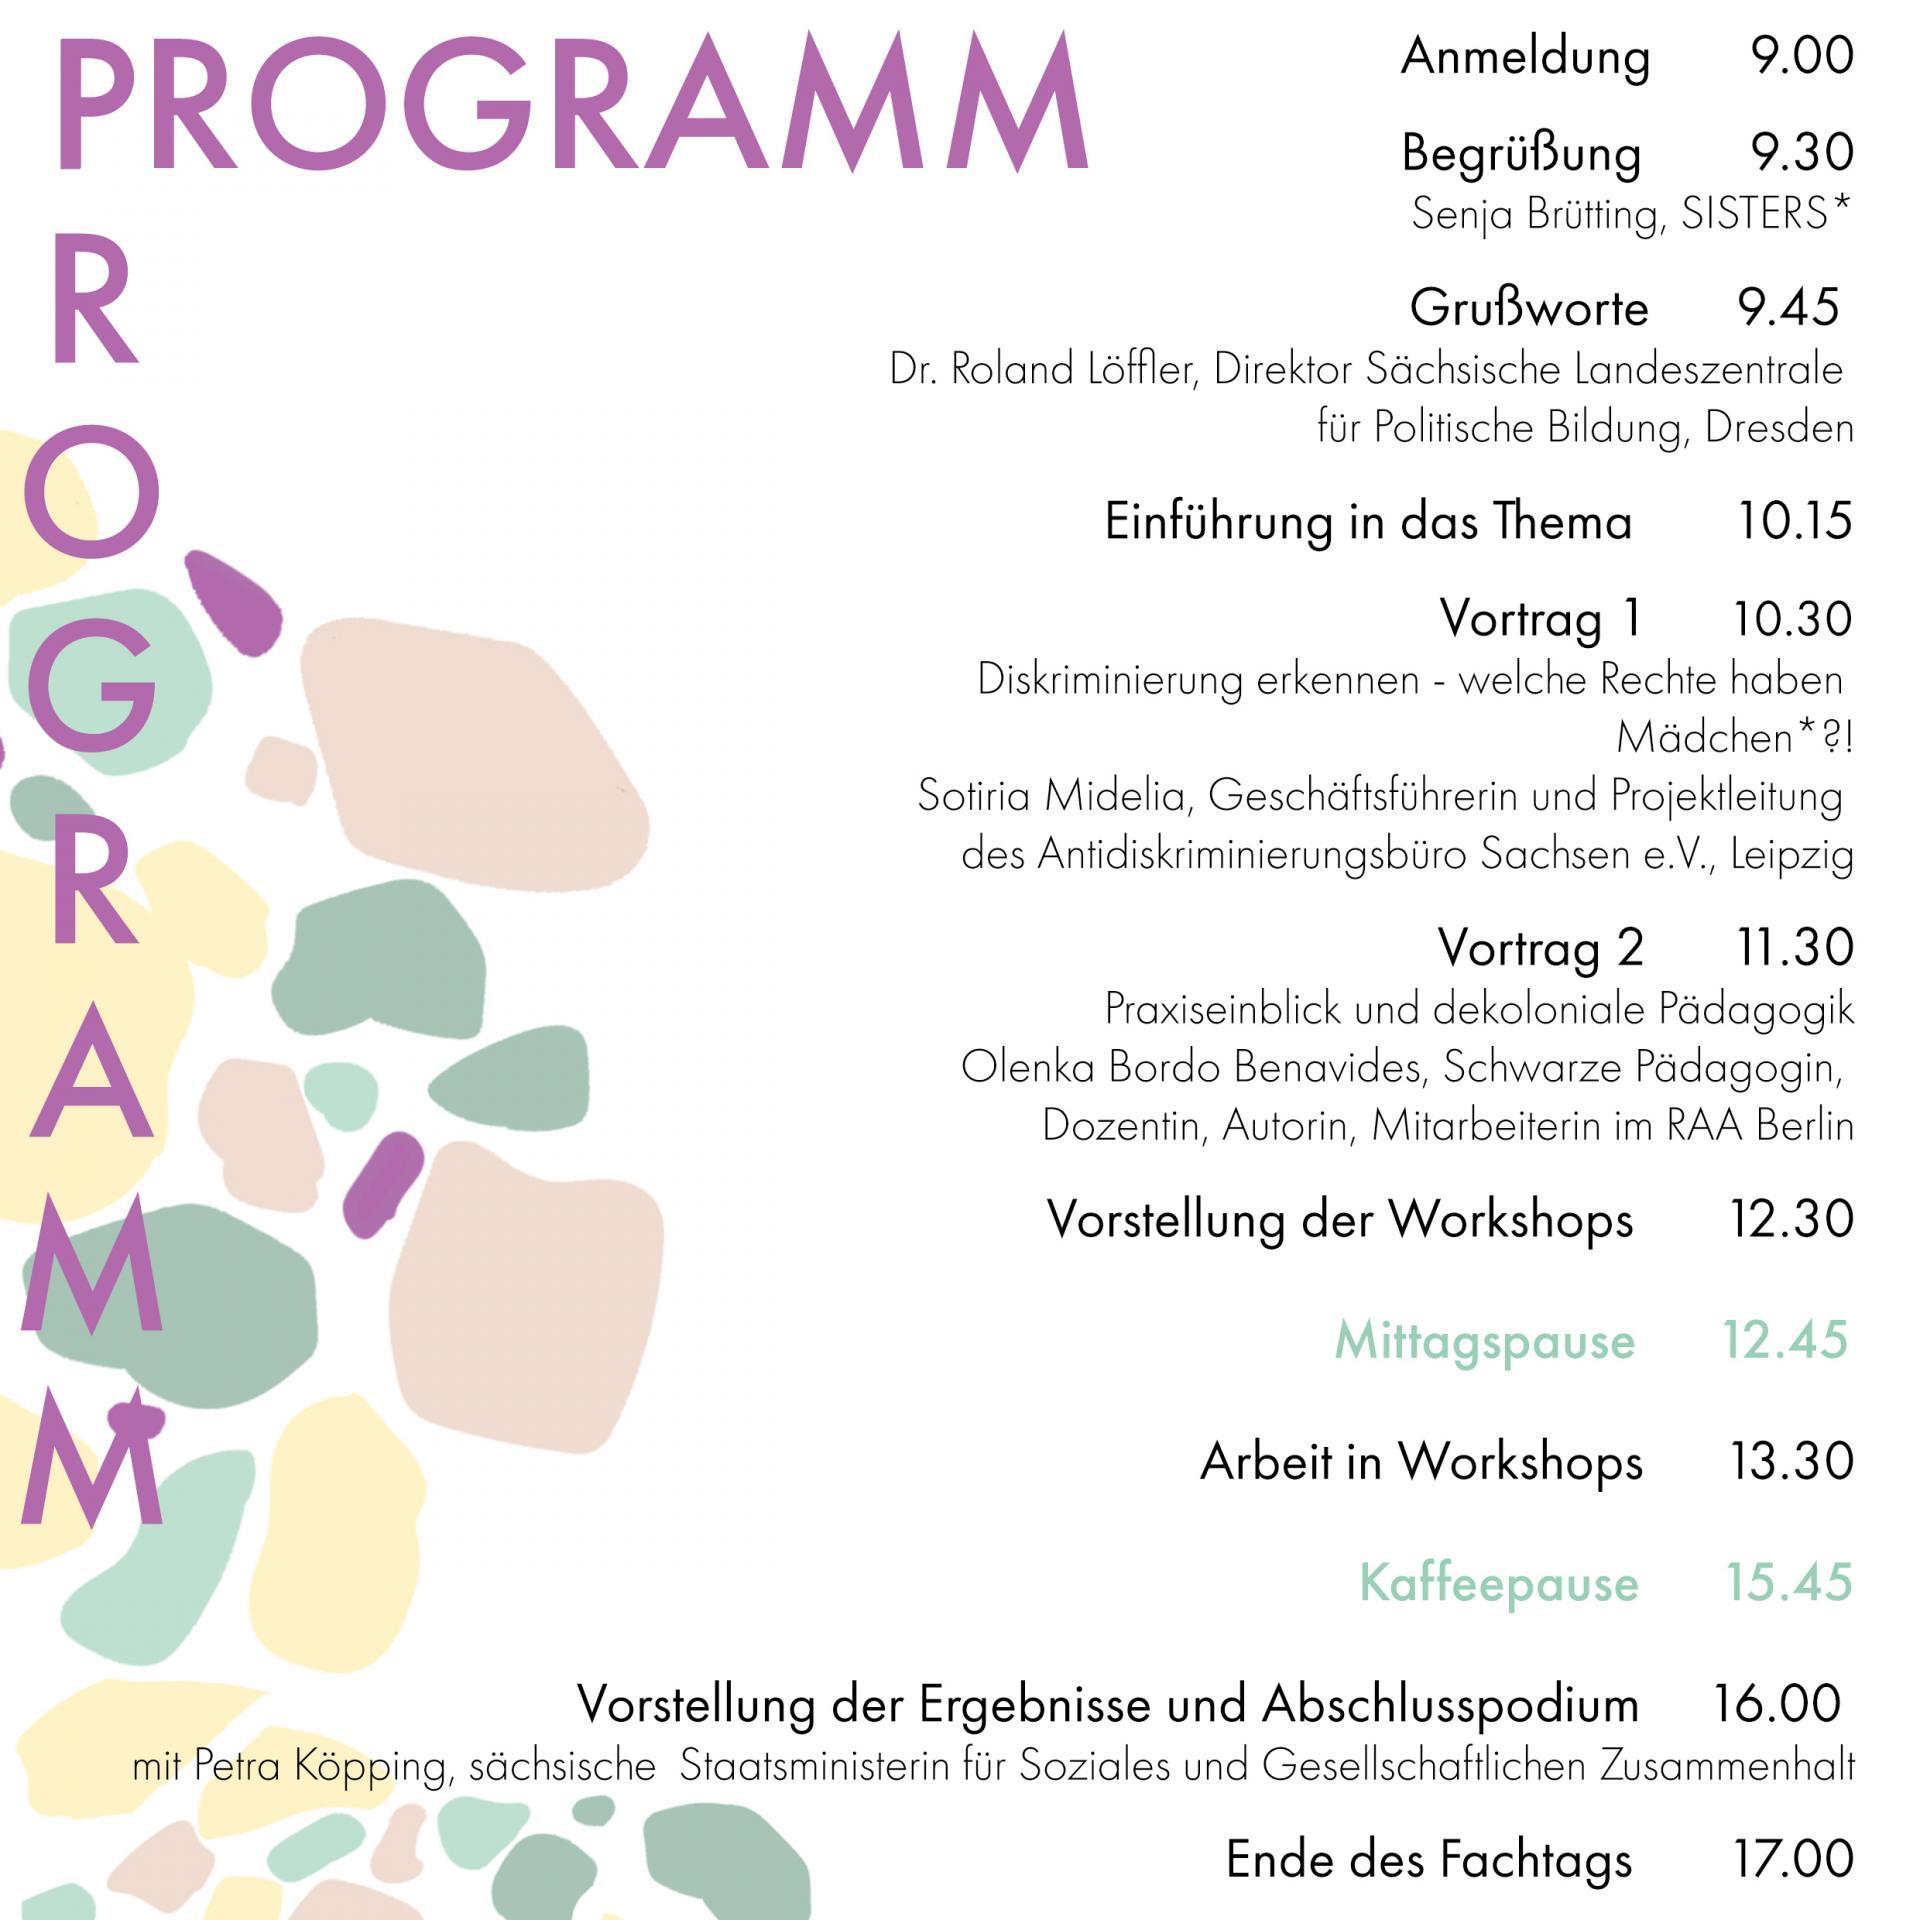 Fachtagsprogramm